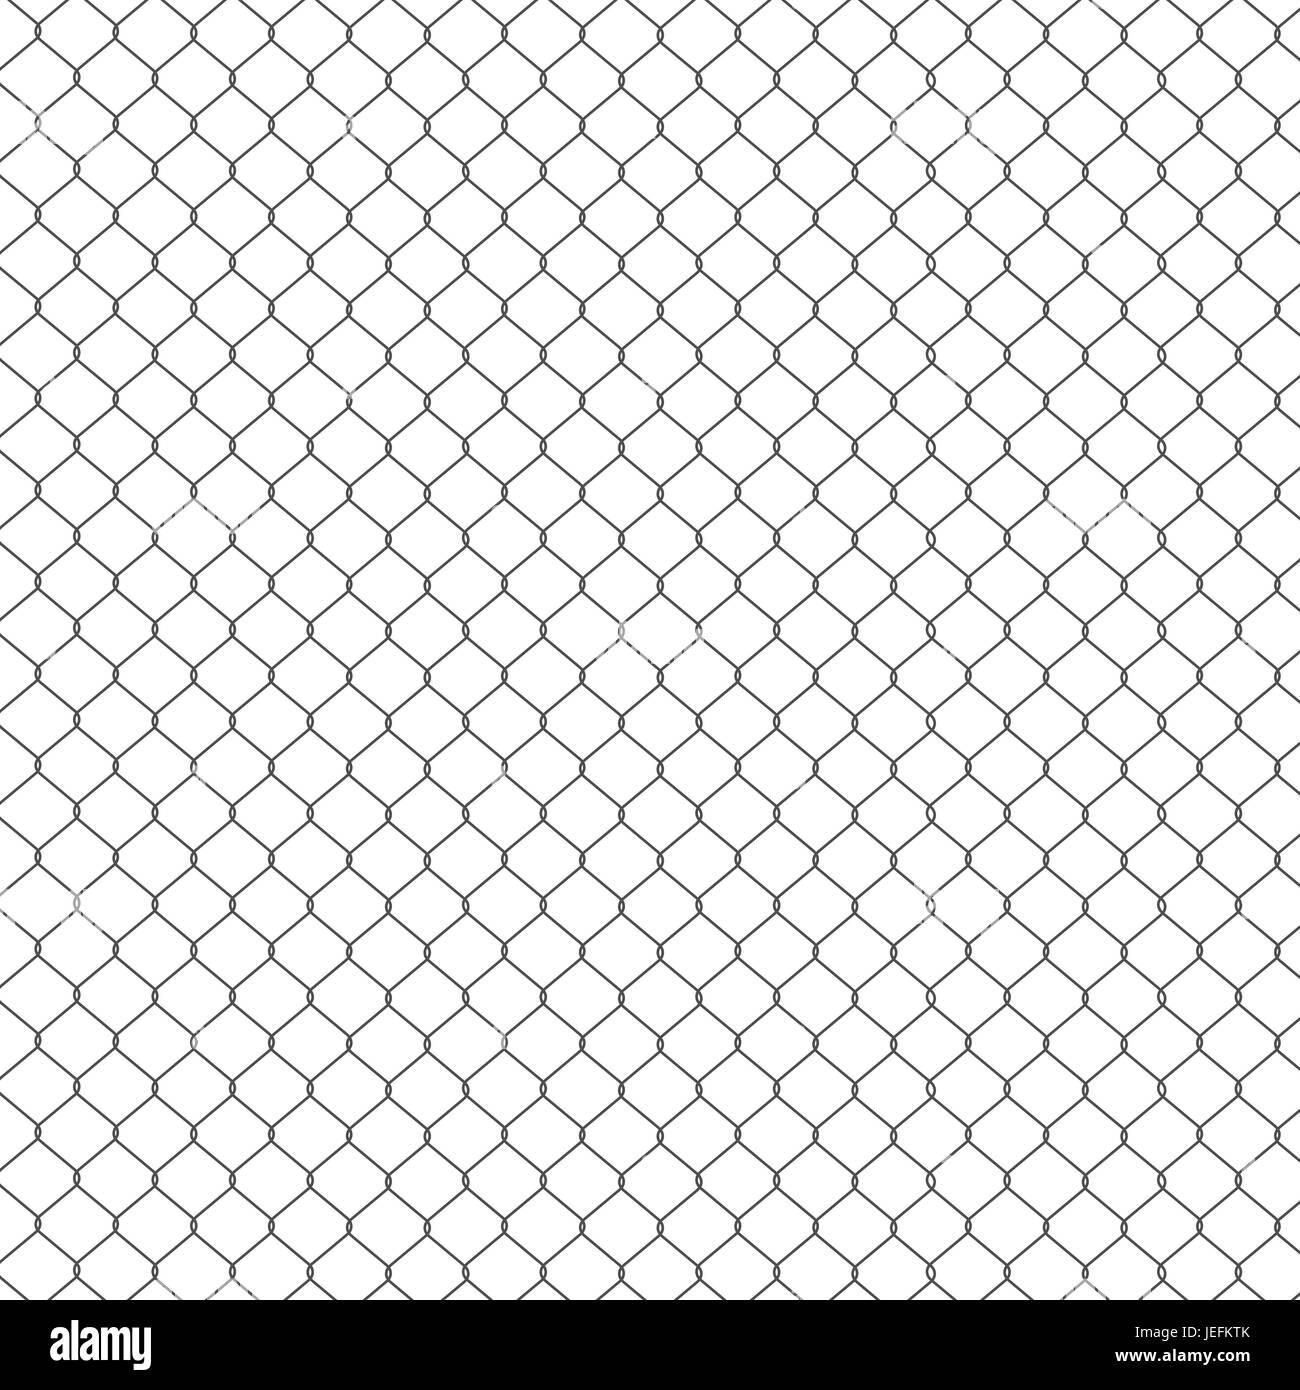 Vector illustration pattern, background steel wire mesh. Grid, wire ...